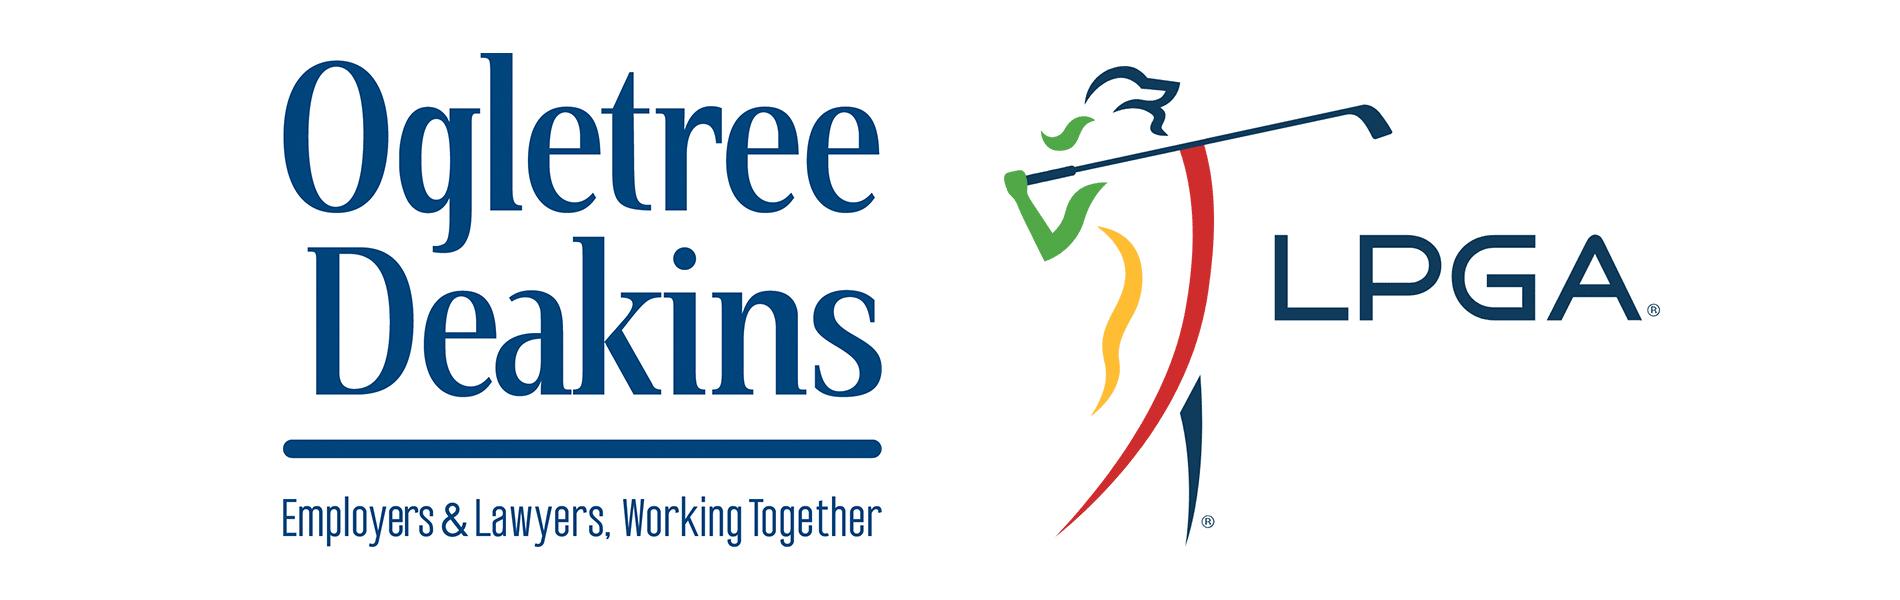 LPGA Announces Partnership with Ogletree Deakins